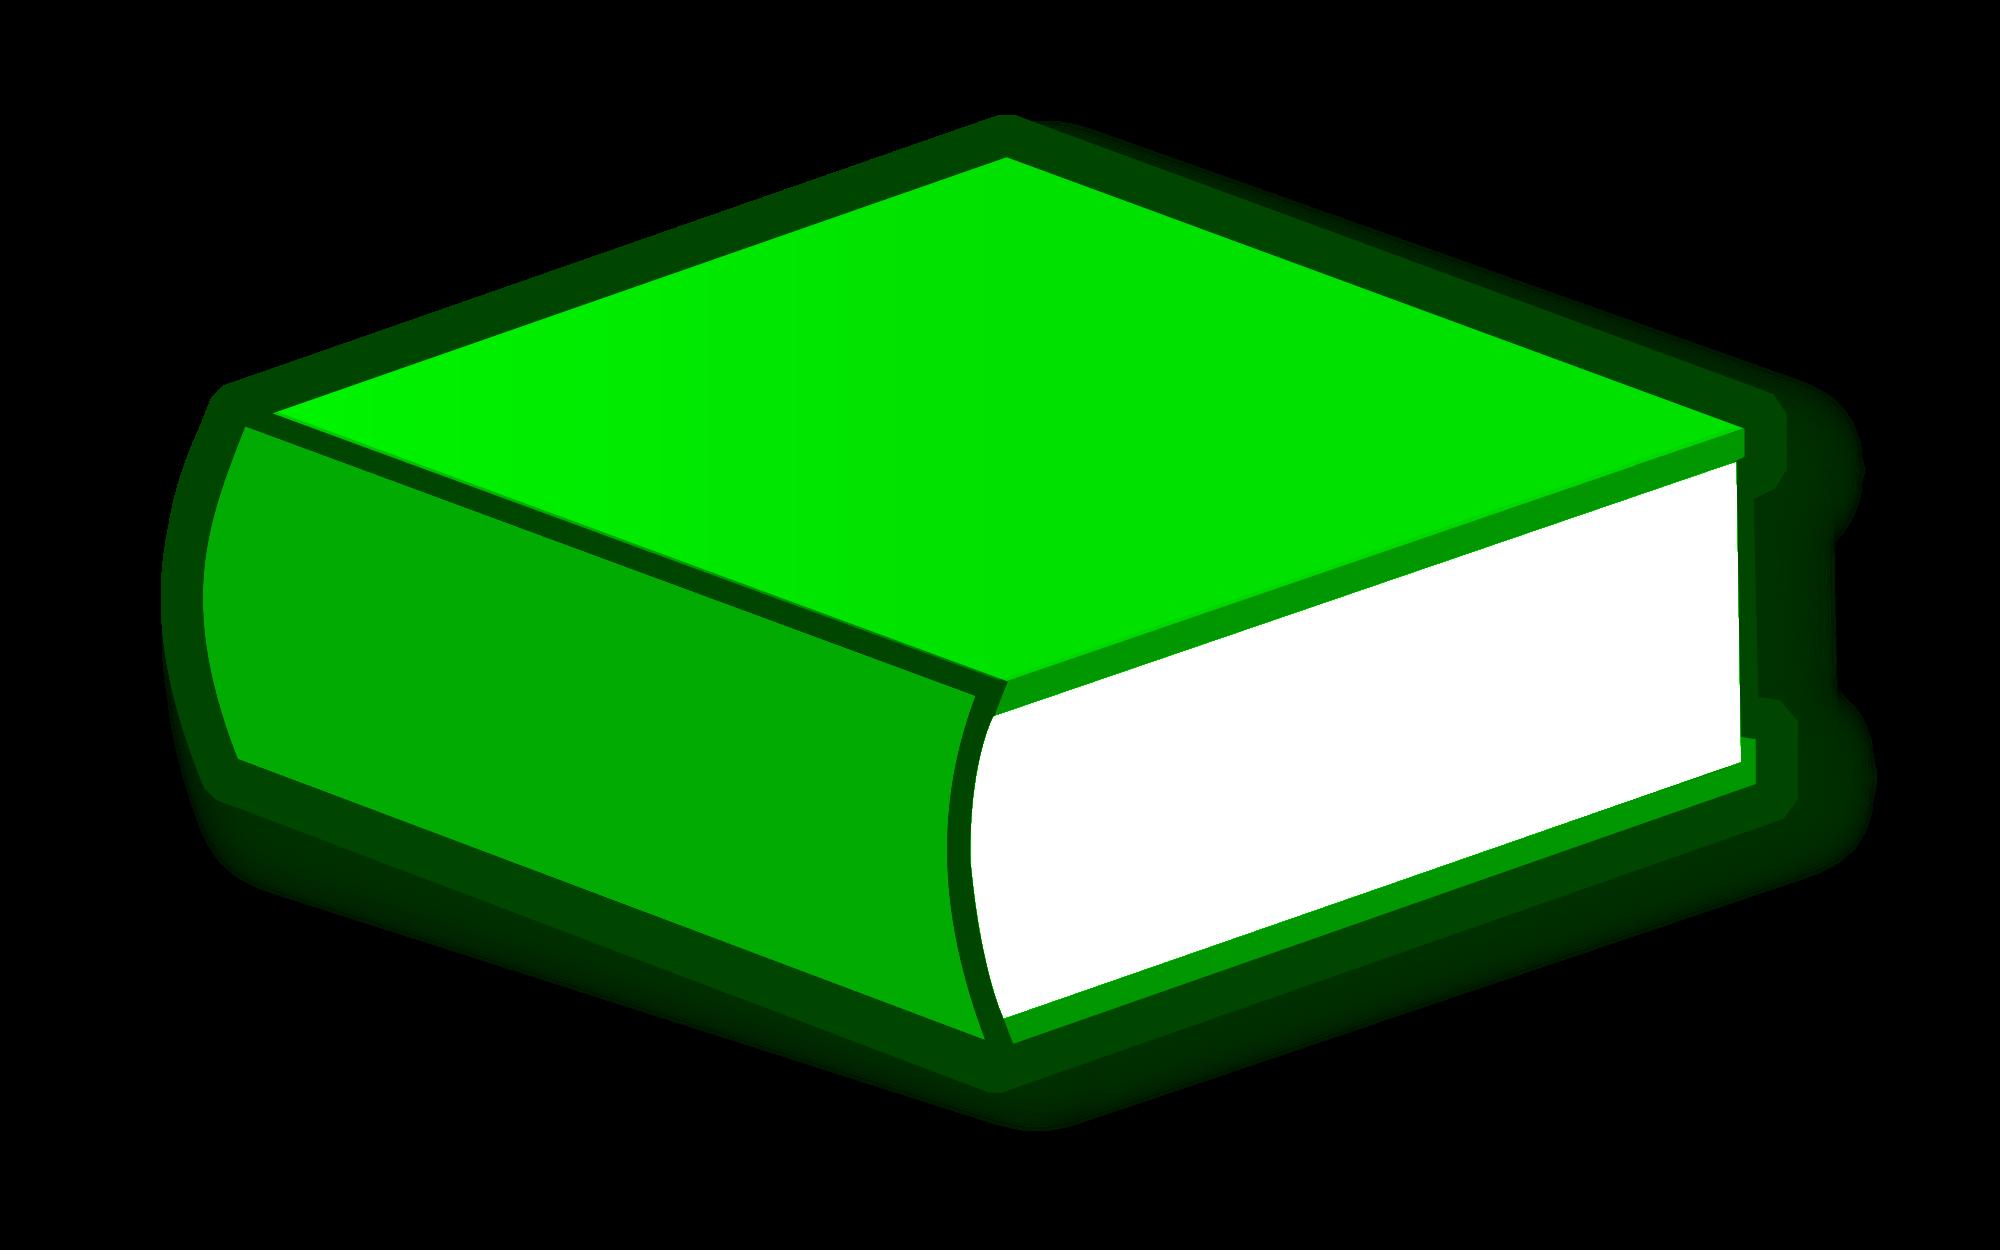 Plik:1 book green.png – Wikipedia, wolna encyklopedia